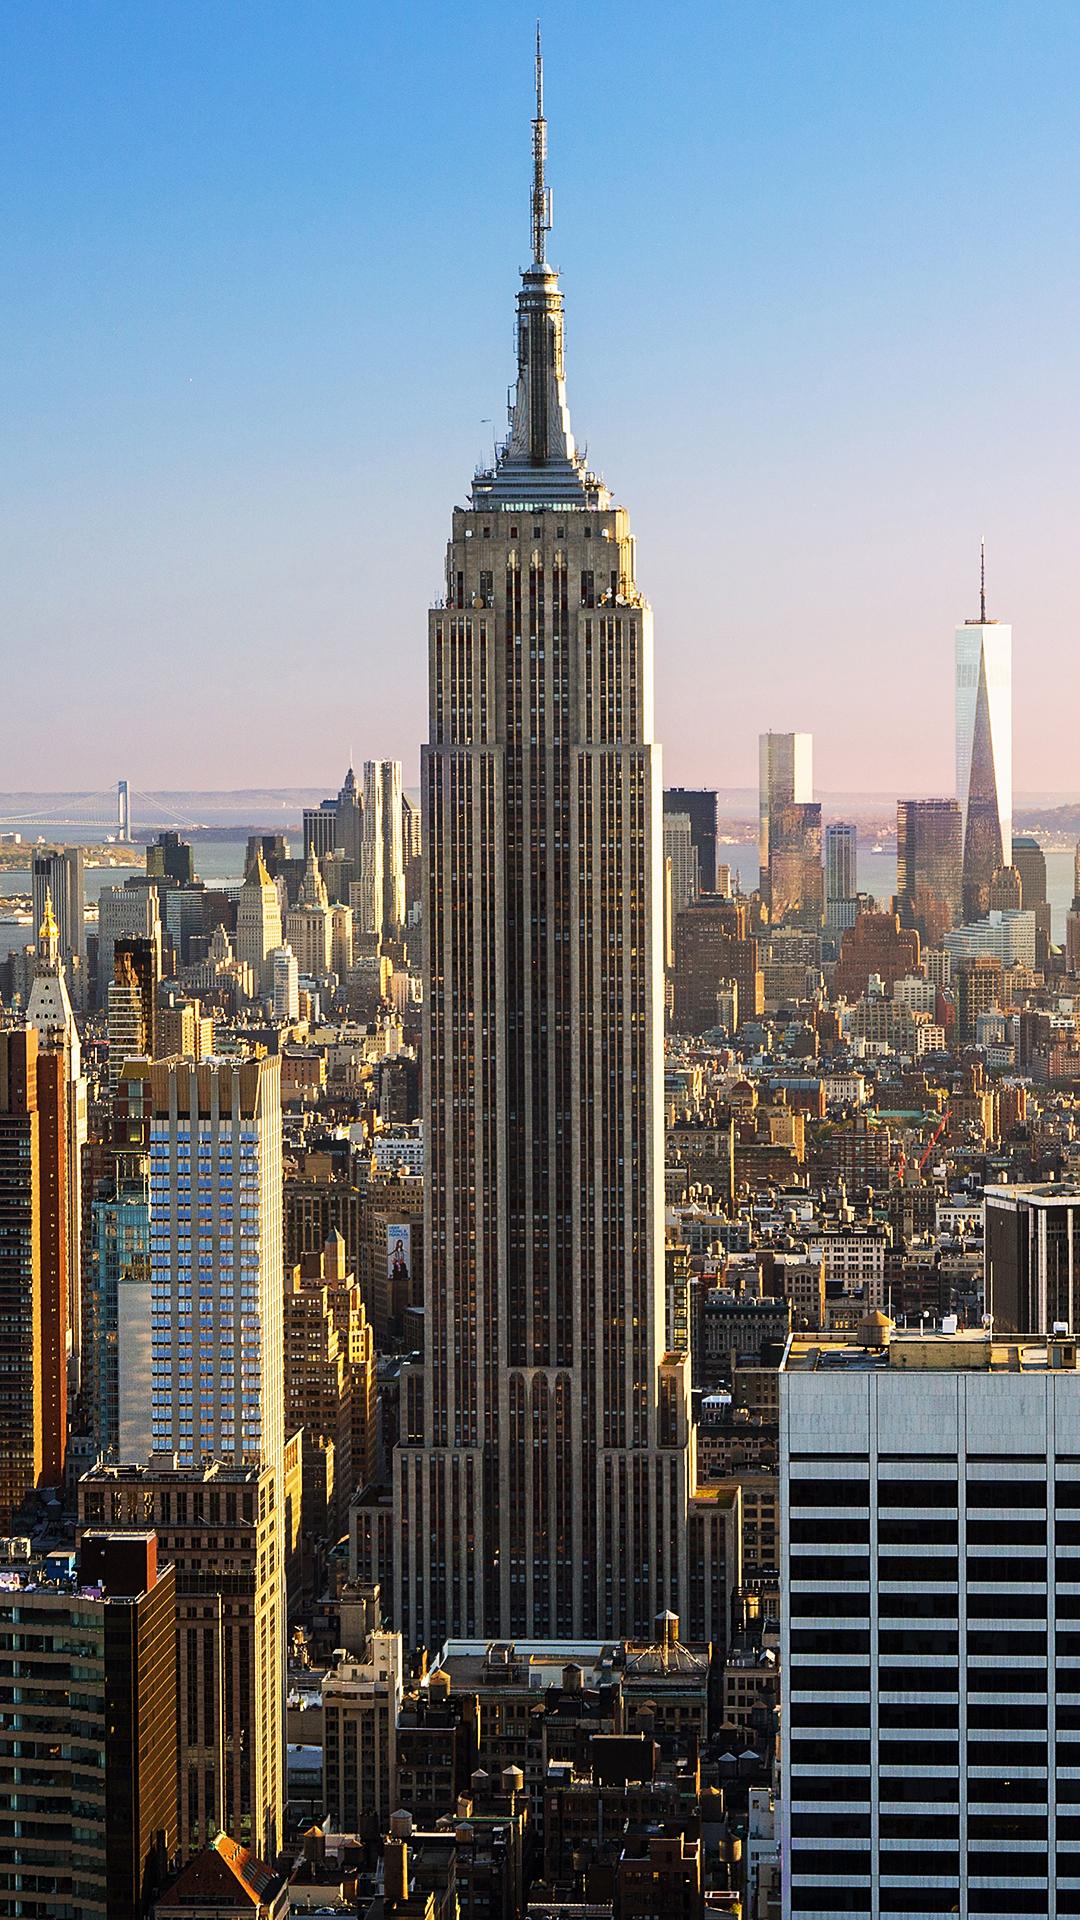 New York City I Phone Wallpaper Hd 1080x1920 Download Hd Wallpaper Wallpapertip